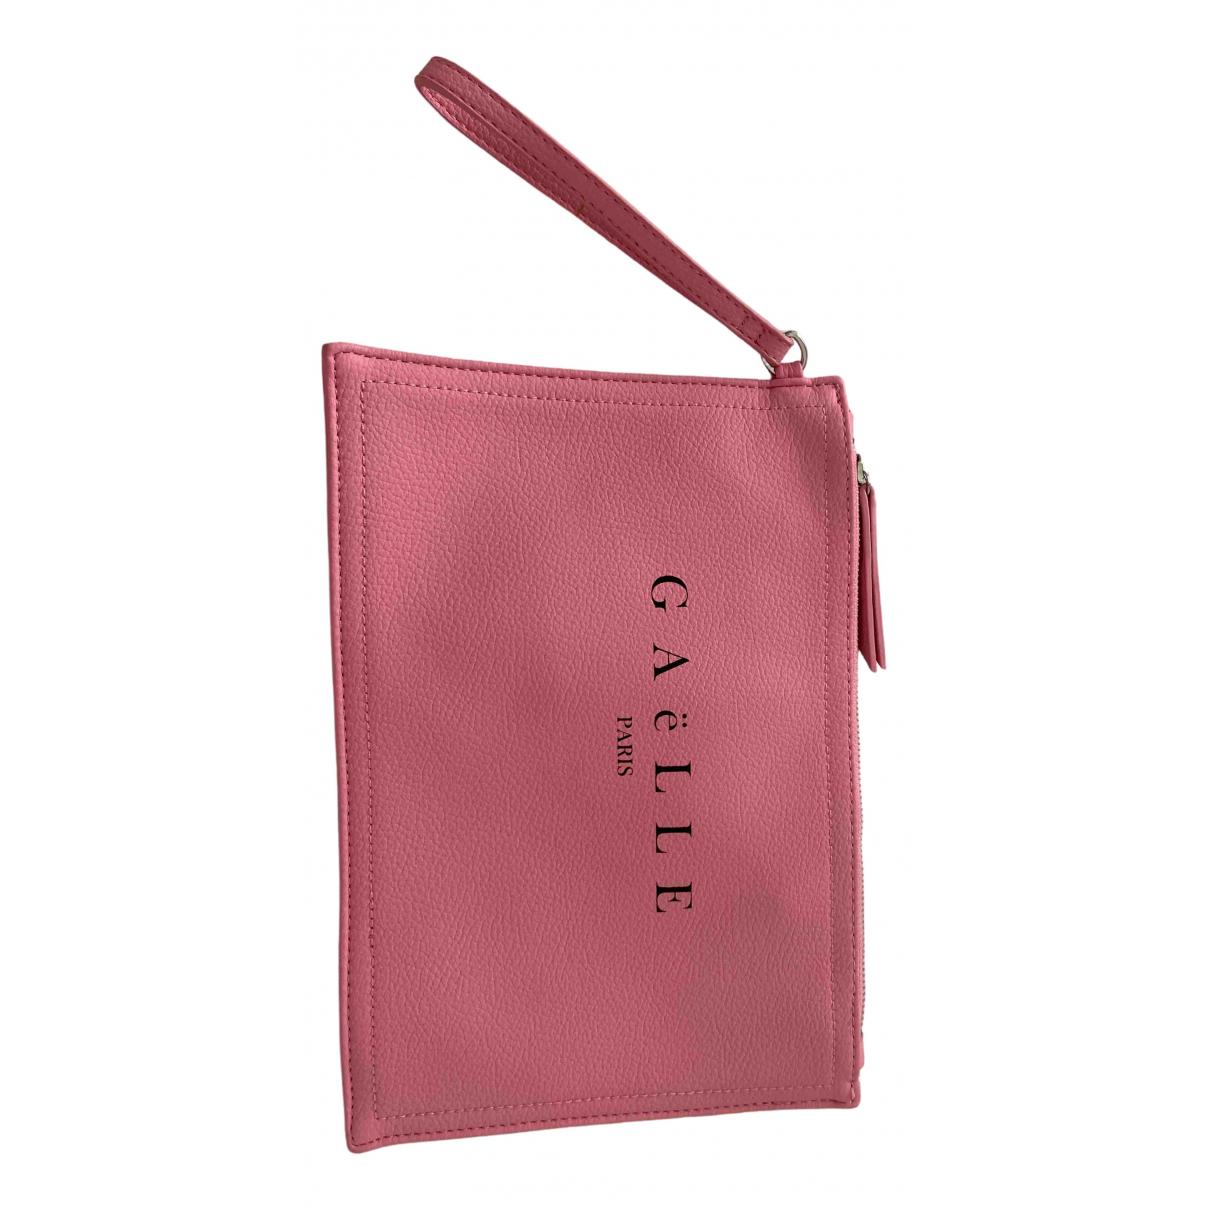 Gaelle Paris N Pink Leather Clutch bag for Women N